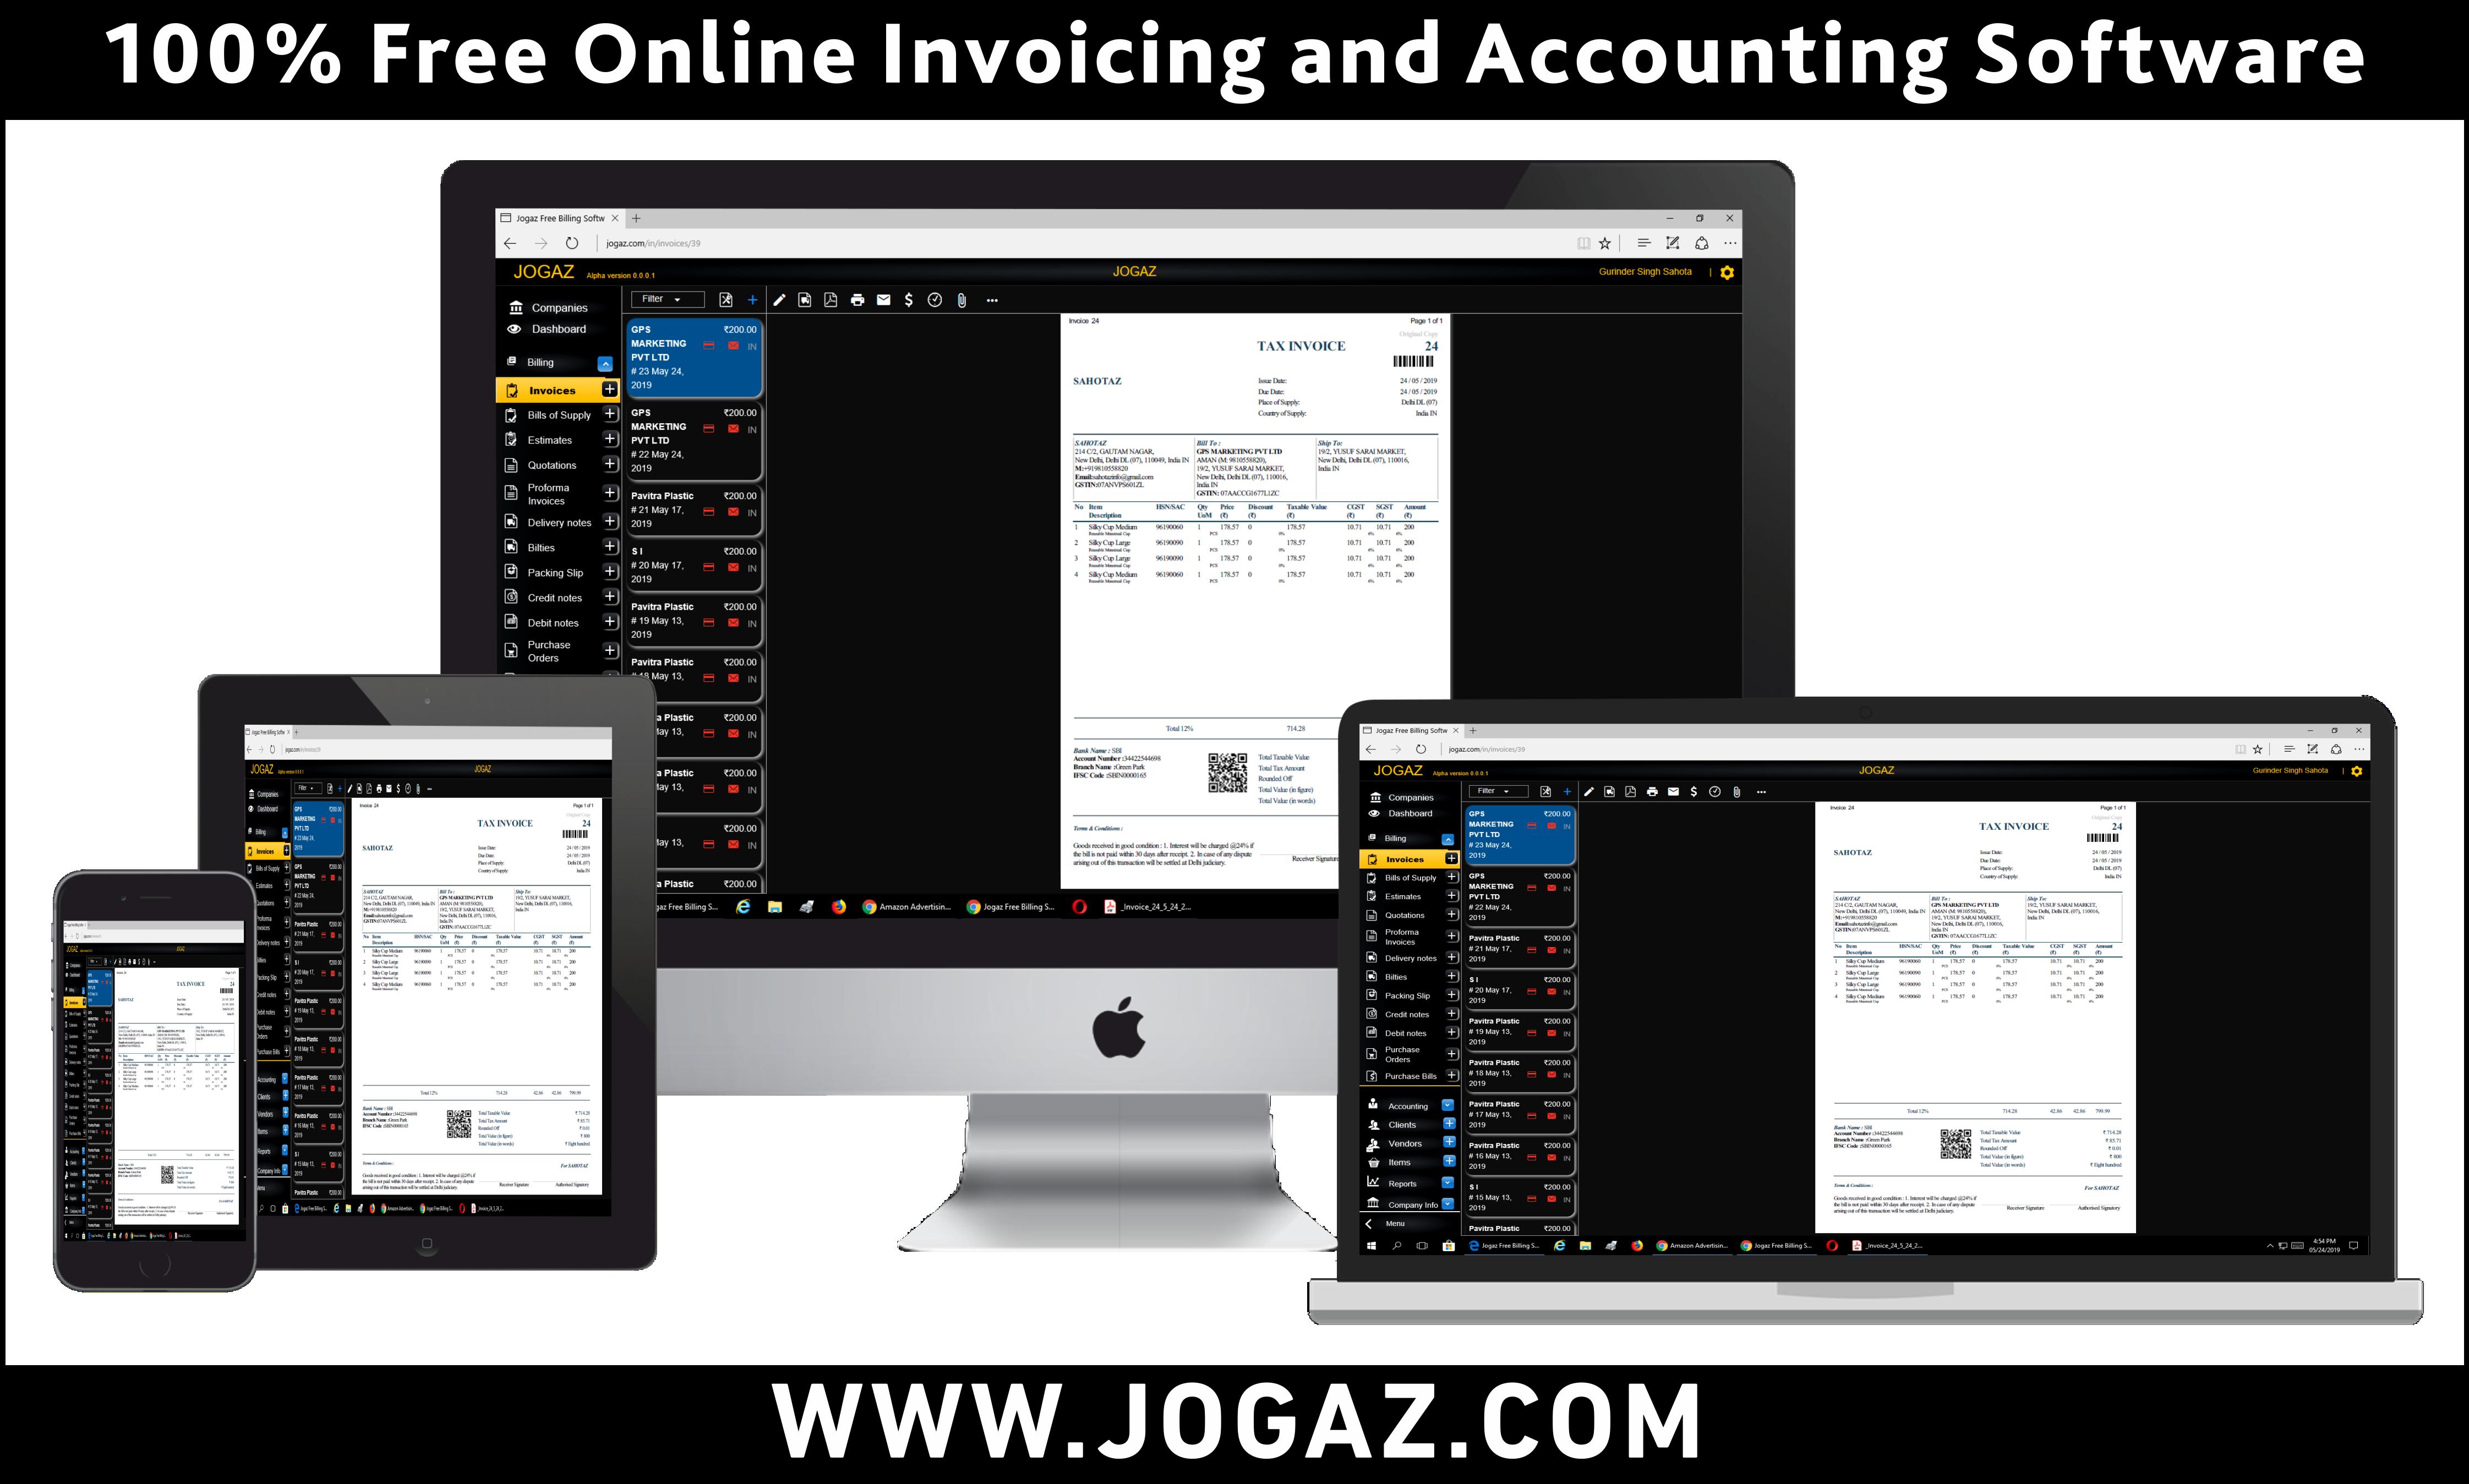 Billing Software Freeware Free Accounting Software Invoicing Software Accounting Software